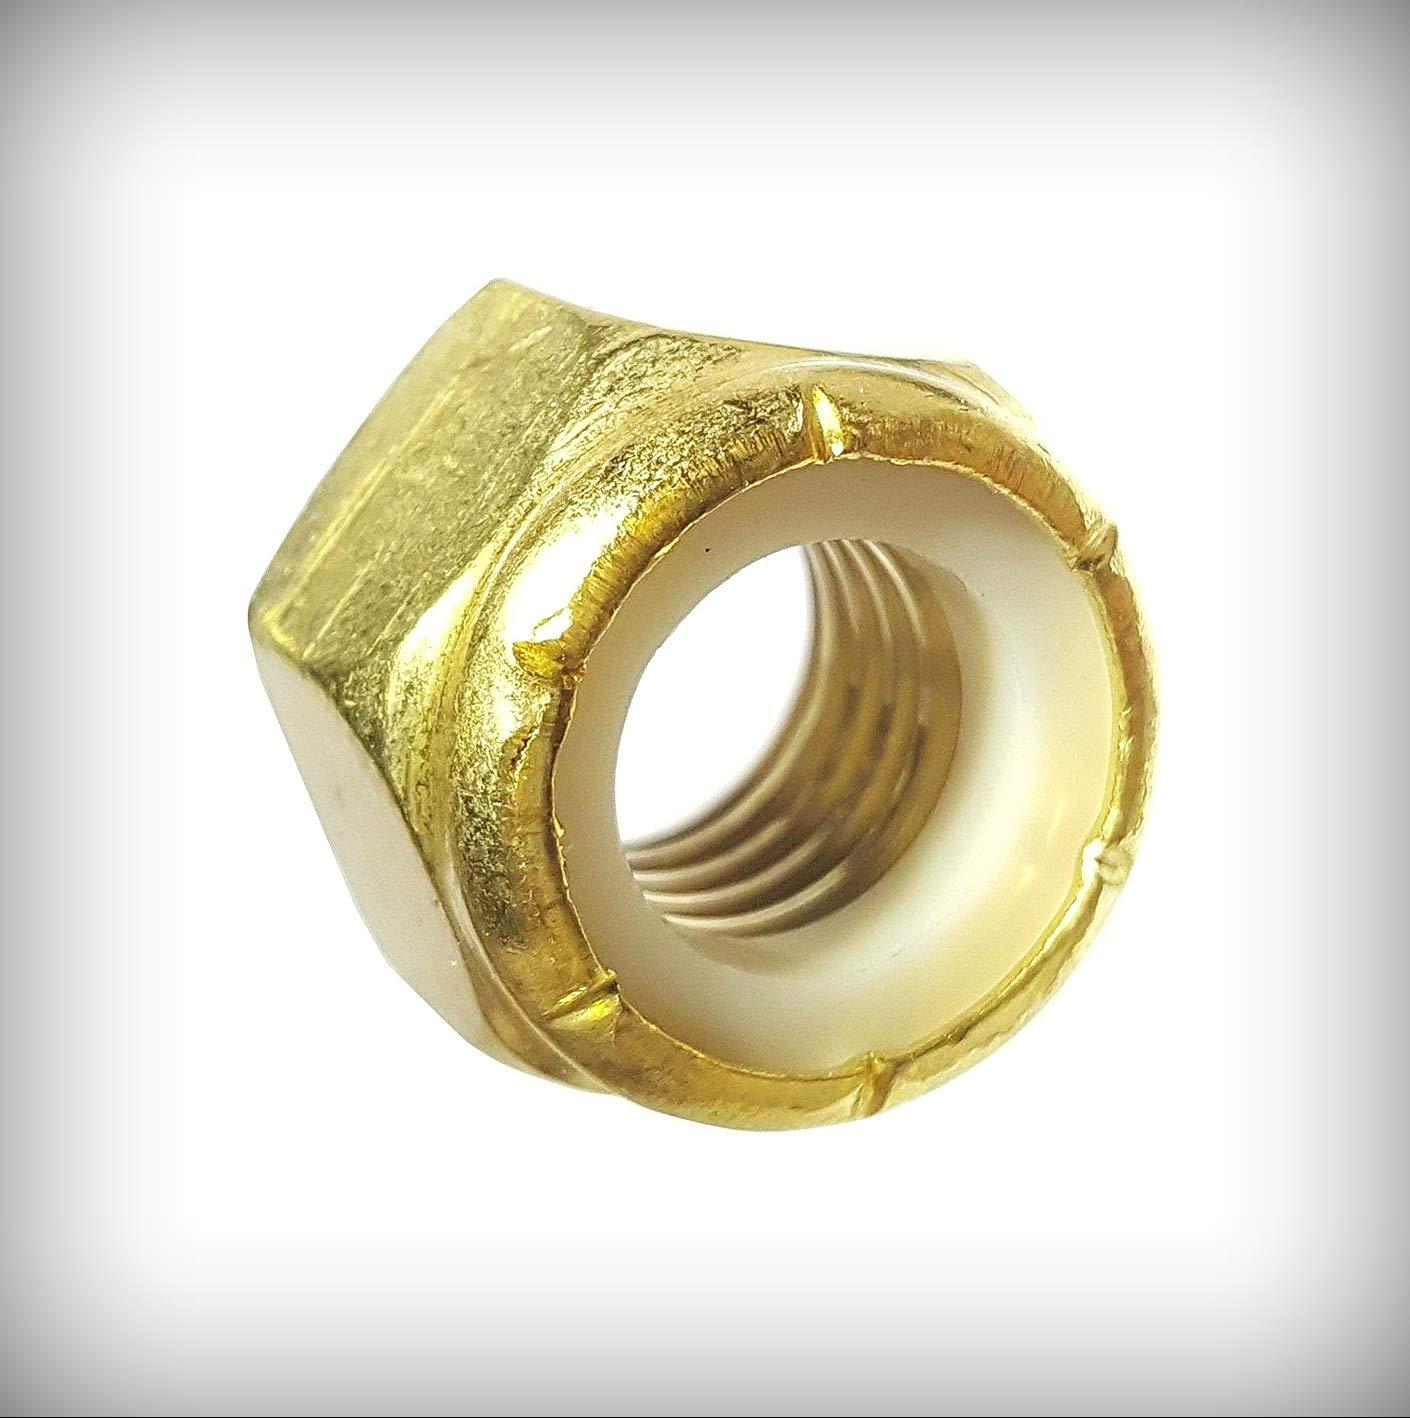 New Lot of 2500 Pcs 10-24 Solid Brass Hex Locknut Nylon Insert Elastic Stop Lock Nuts Set #Lig-2910NG Warranity by Pr-Mch